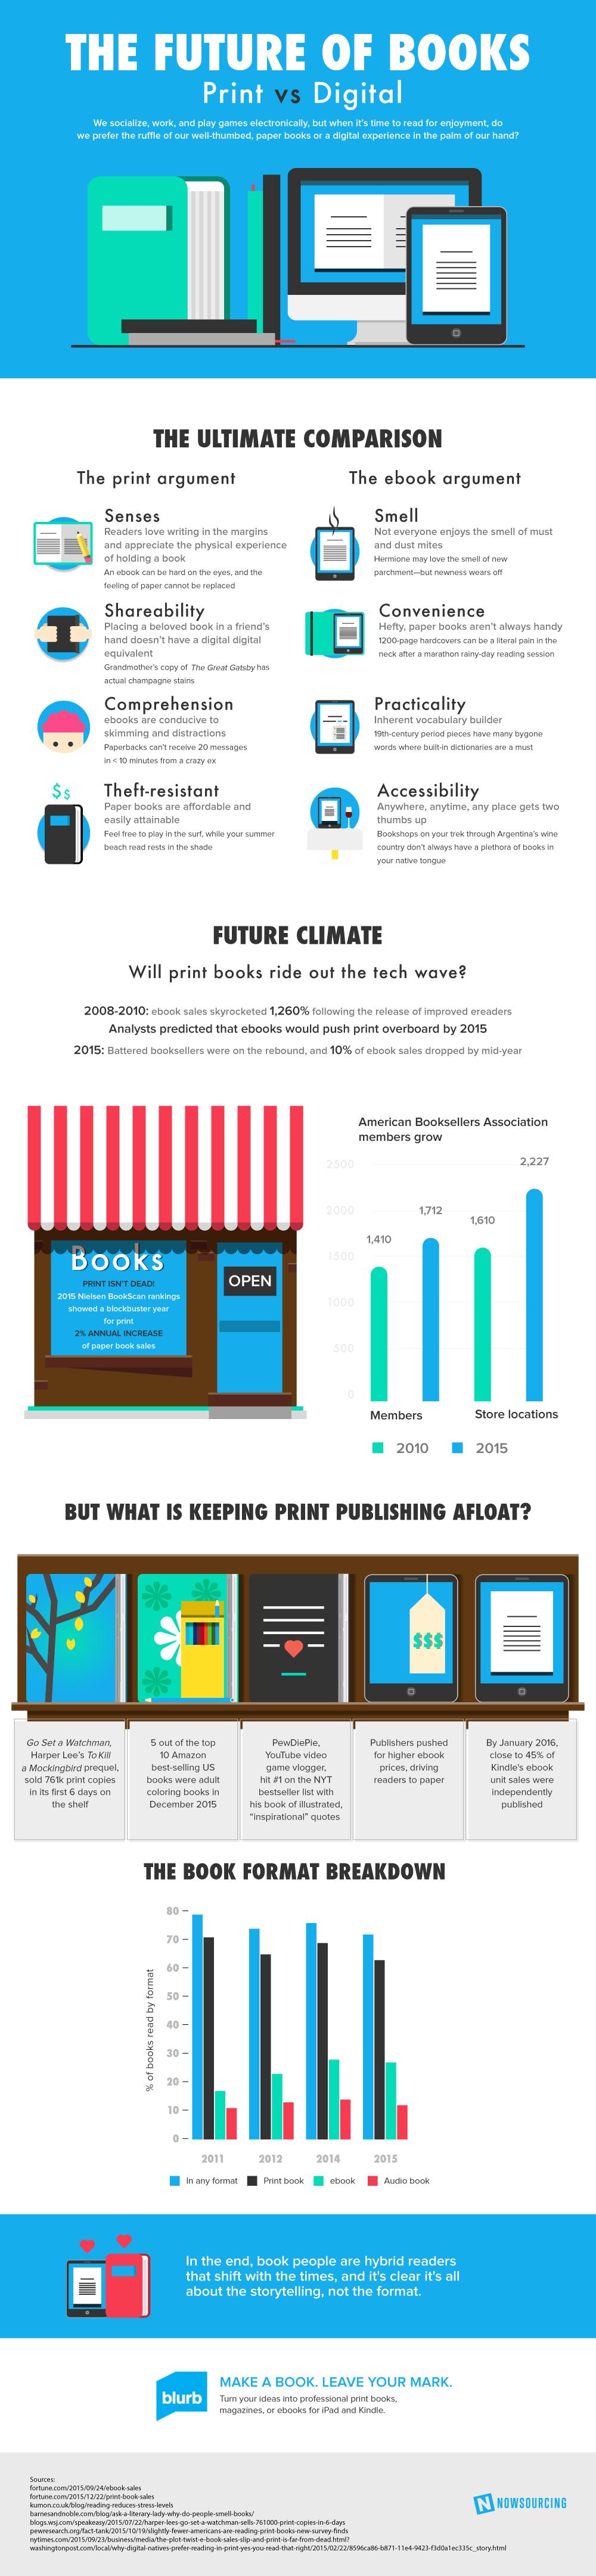 Whether you read print or digital books, the future of readi... via Brian Wallace